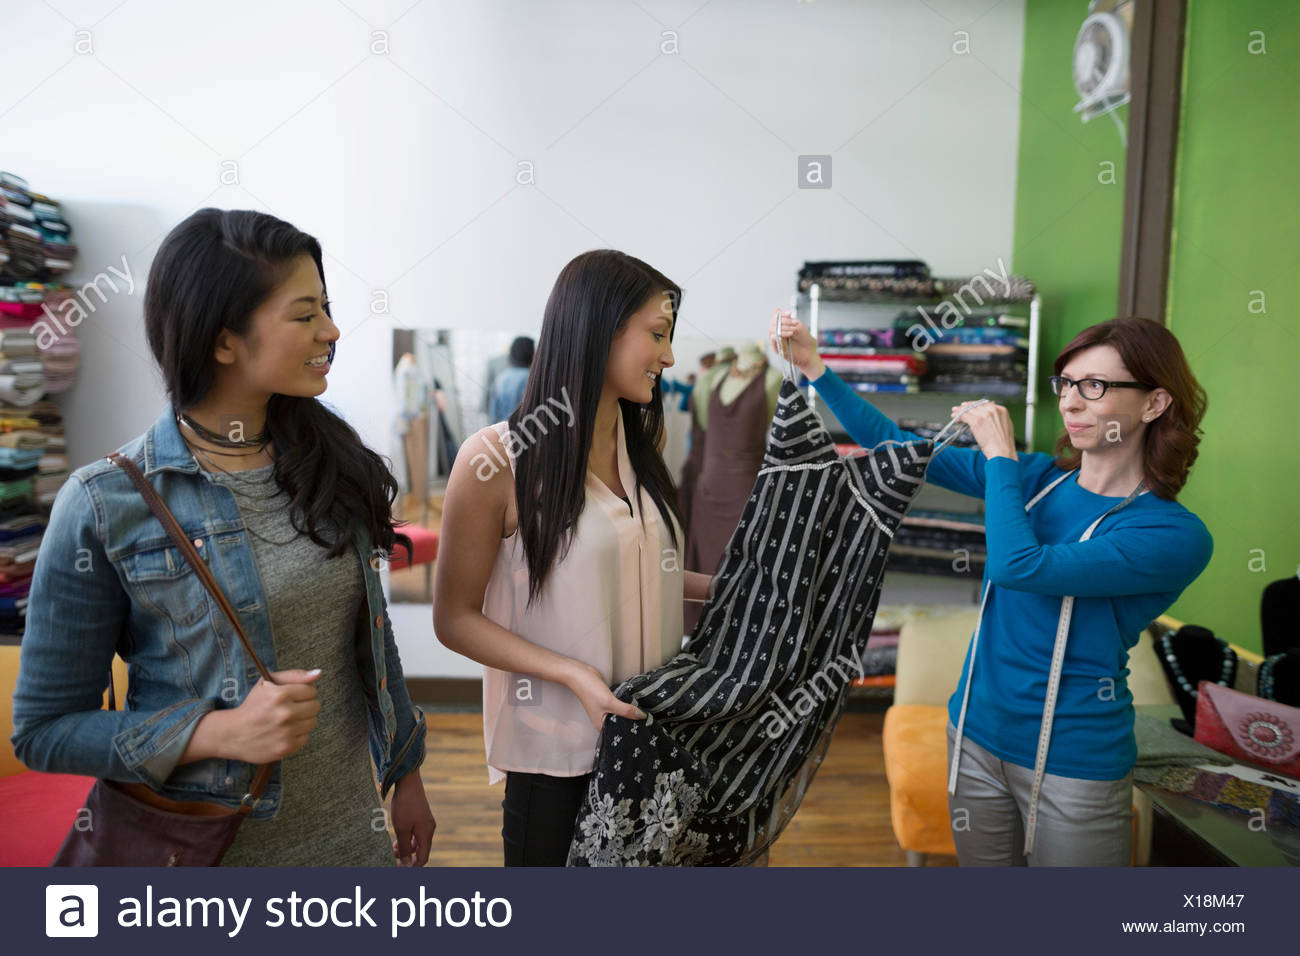 Dressmaker showing women dress - Stock Image